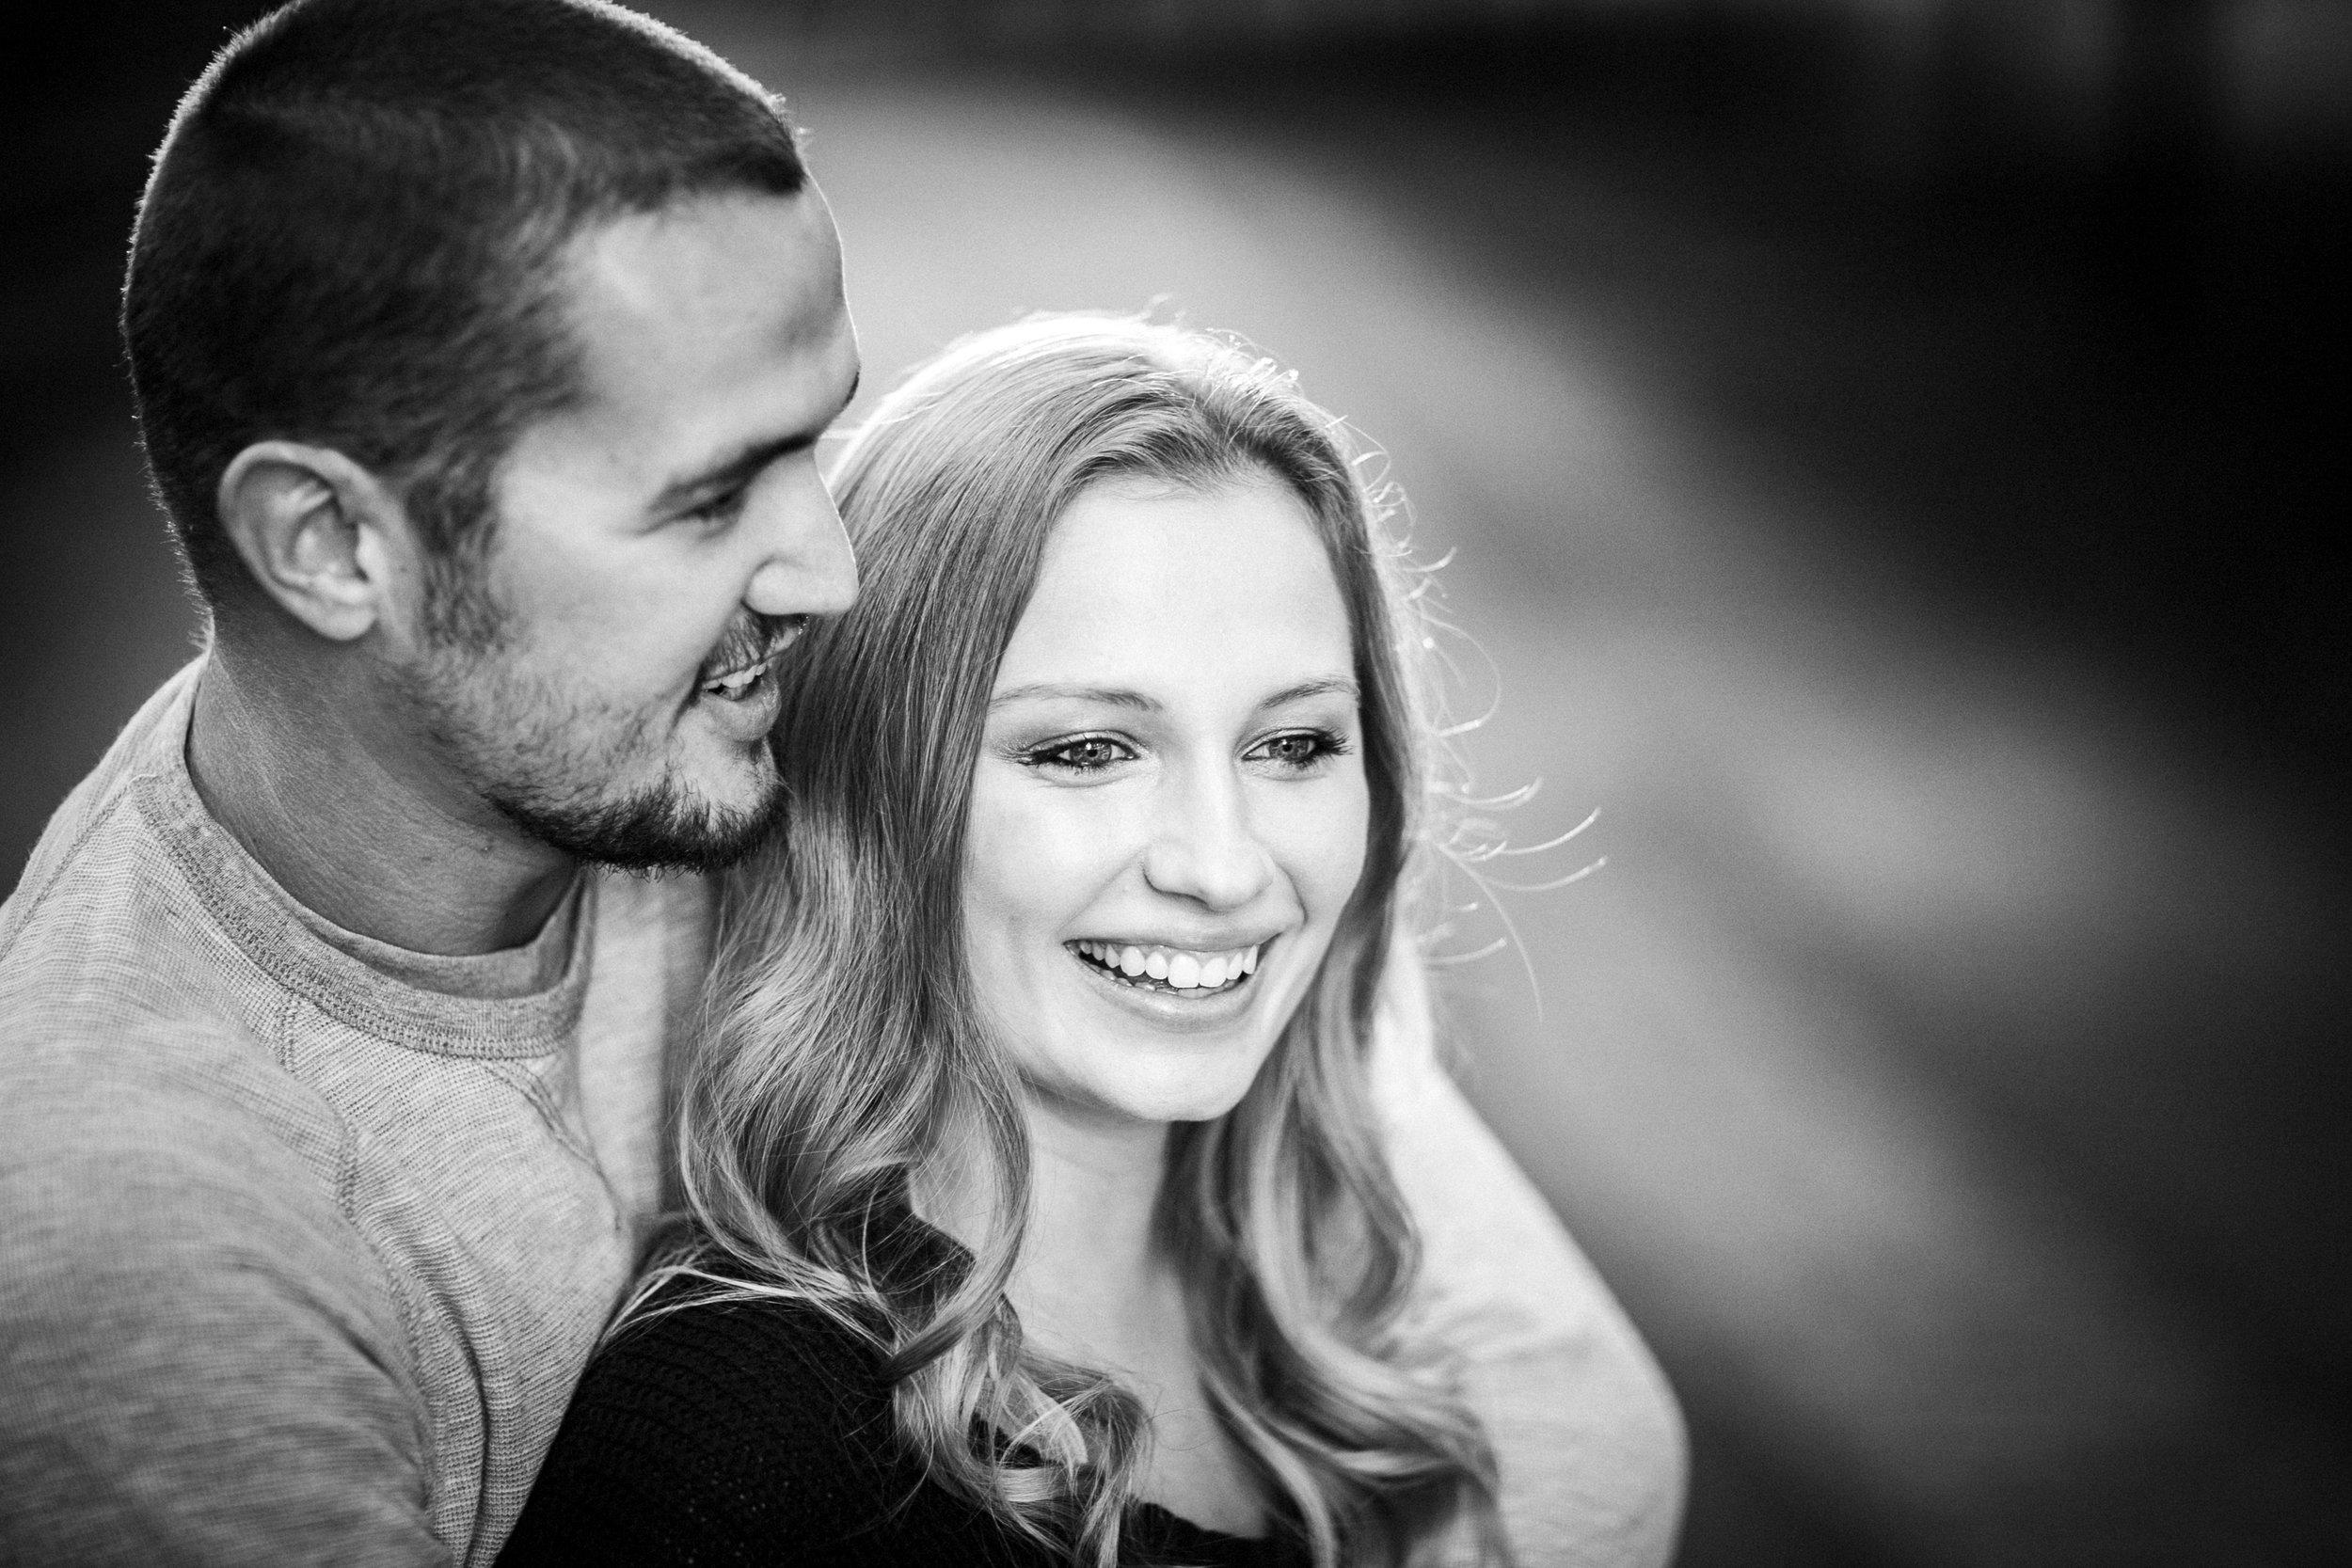 New-Jersey-Wedding-Photography-Engagement-Smithville-Megan&Nick_BW-11.jpg